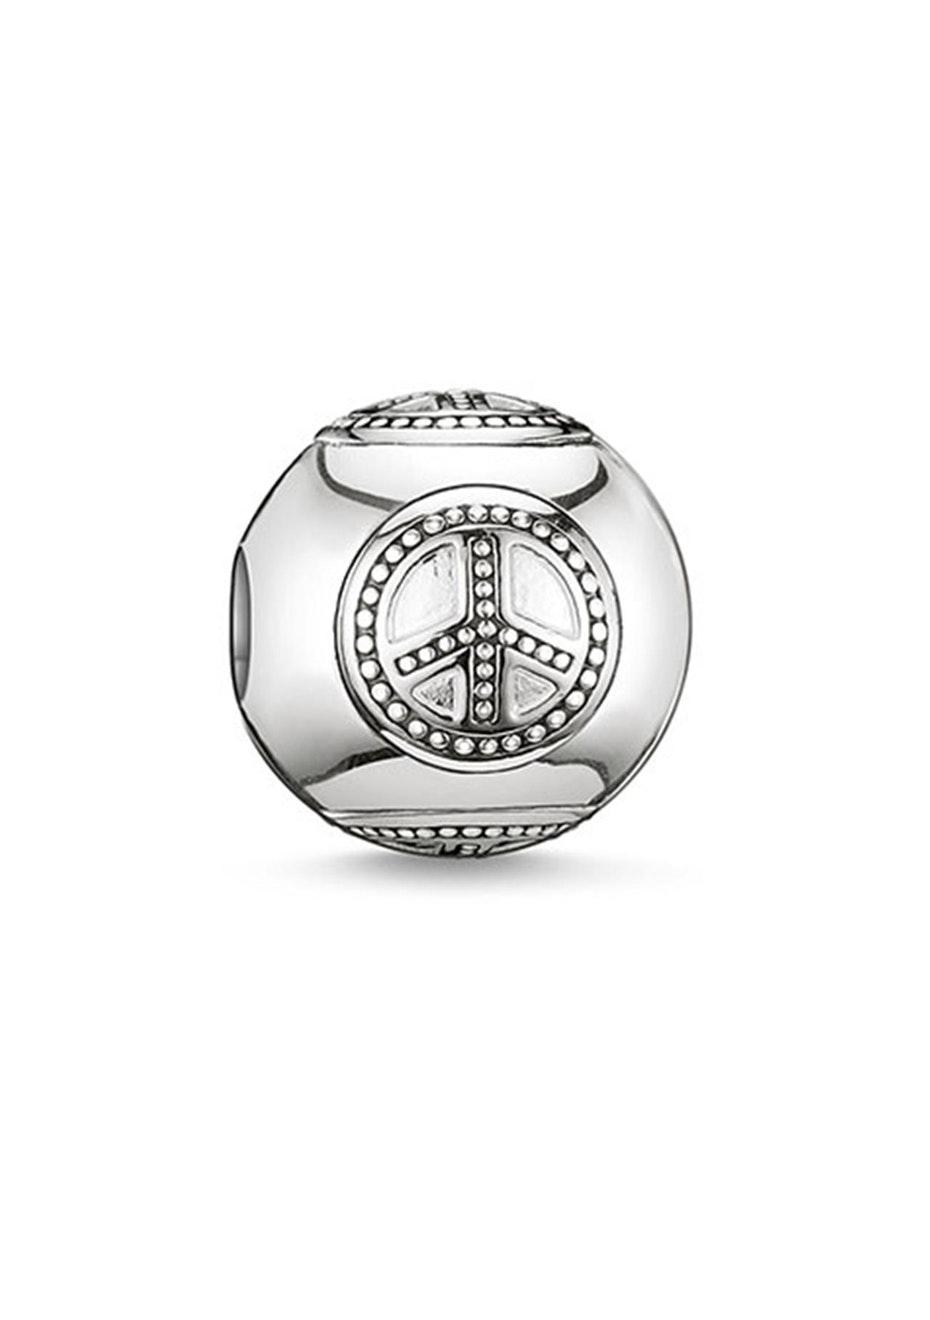 Thomas Sabo  - Karma Bead -  Peace Symbol